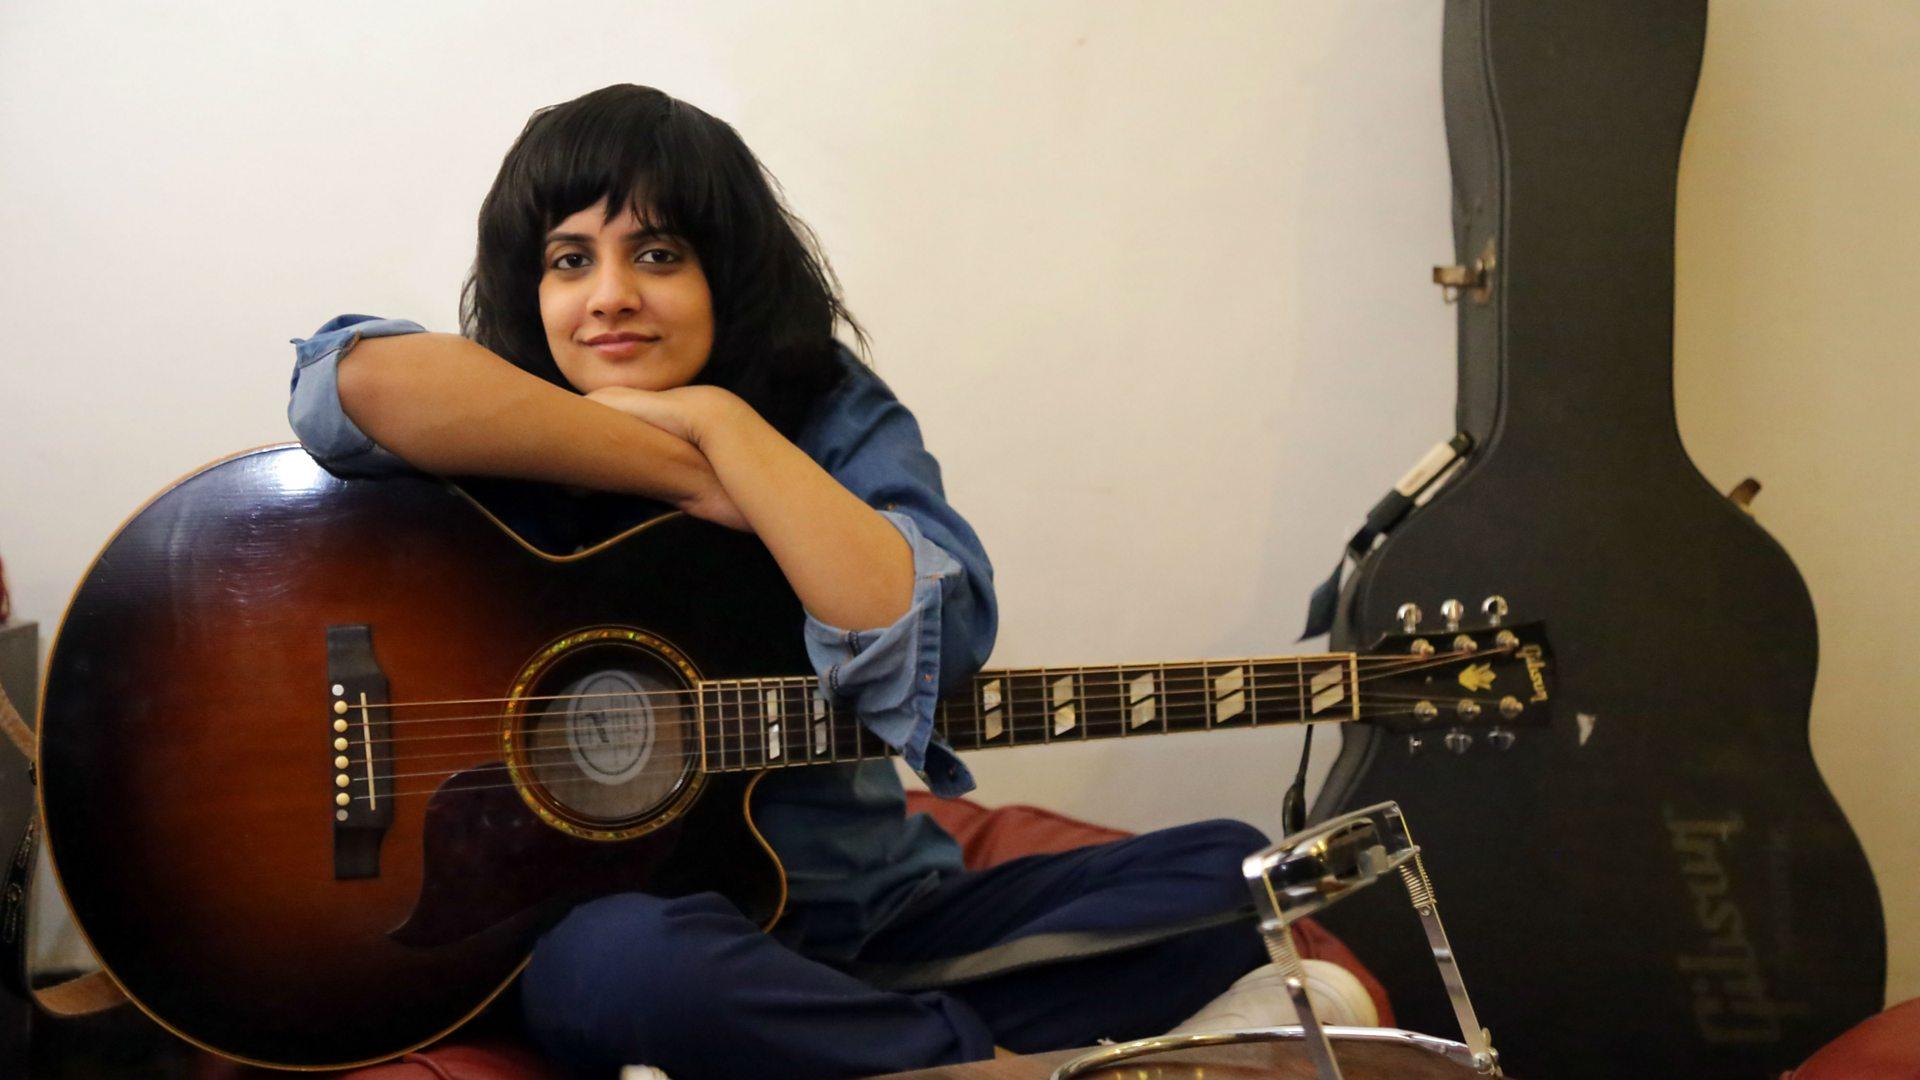 Imgenes De Love You Zindagi Song On Guitar